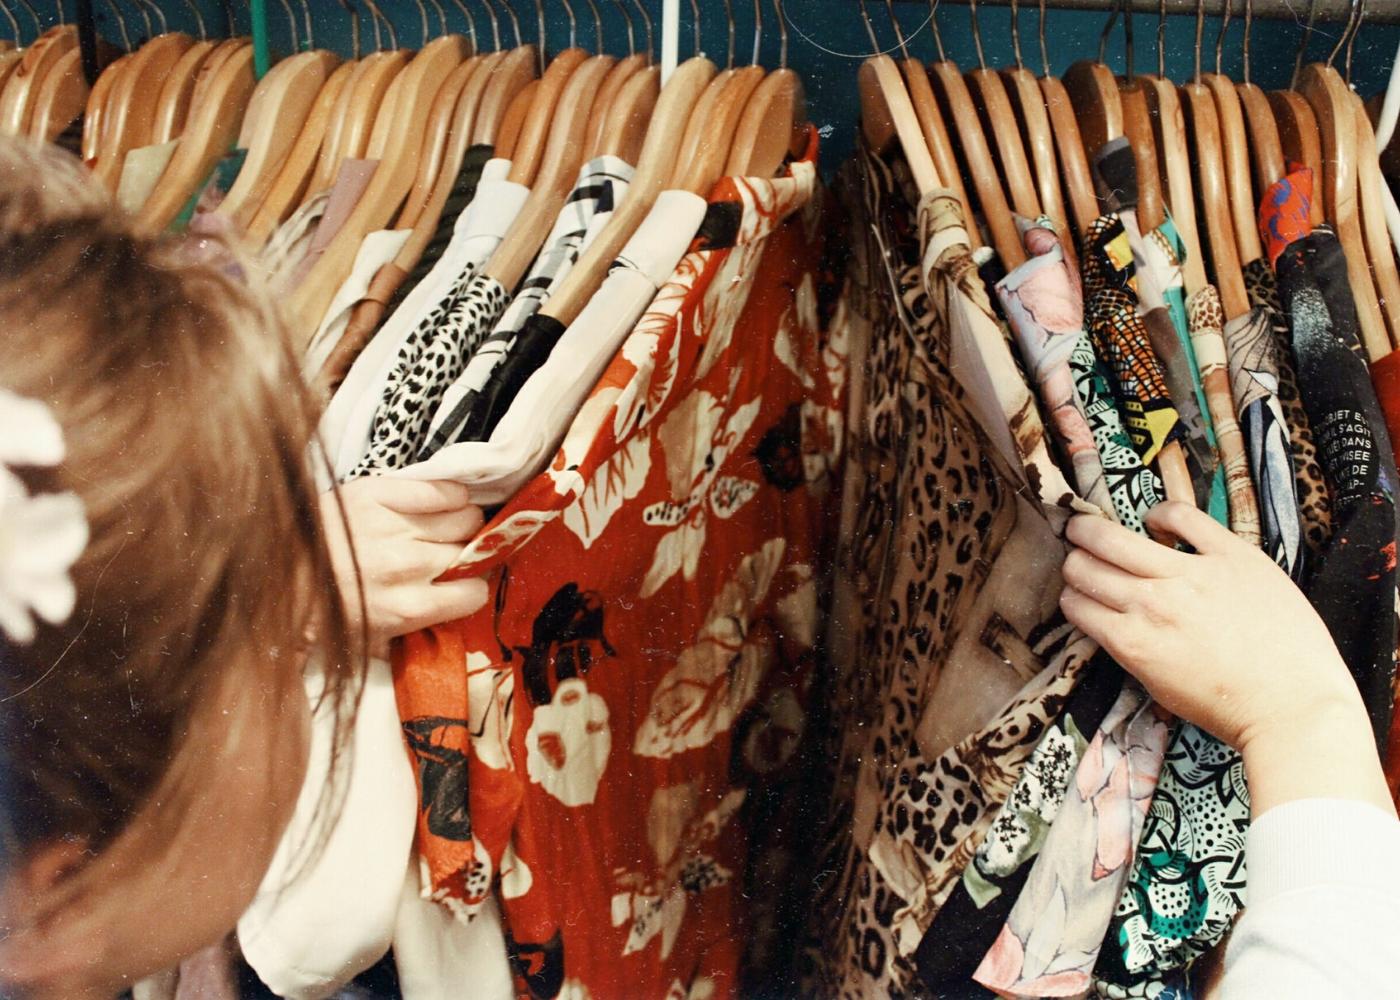 shopping clothes rack